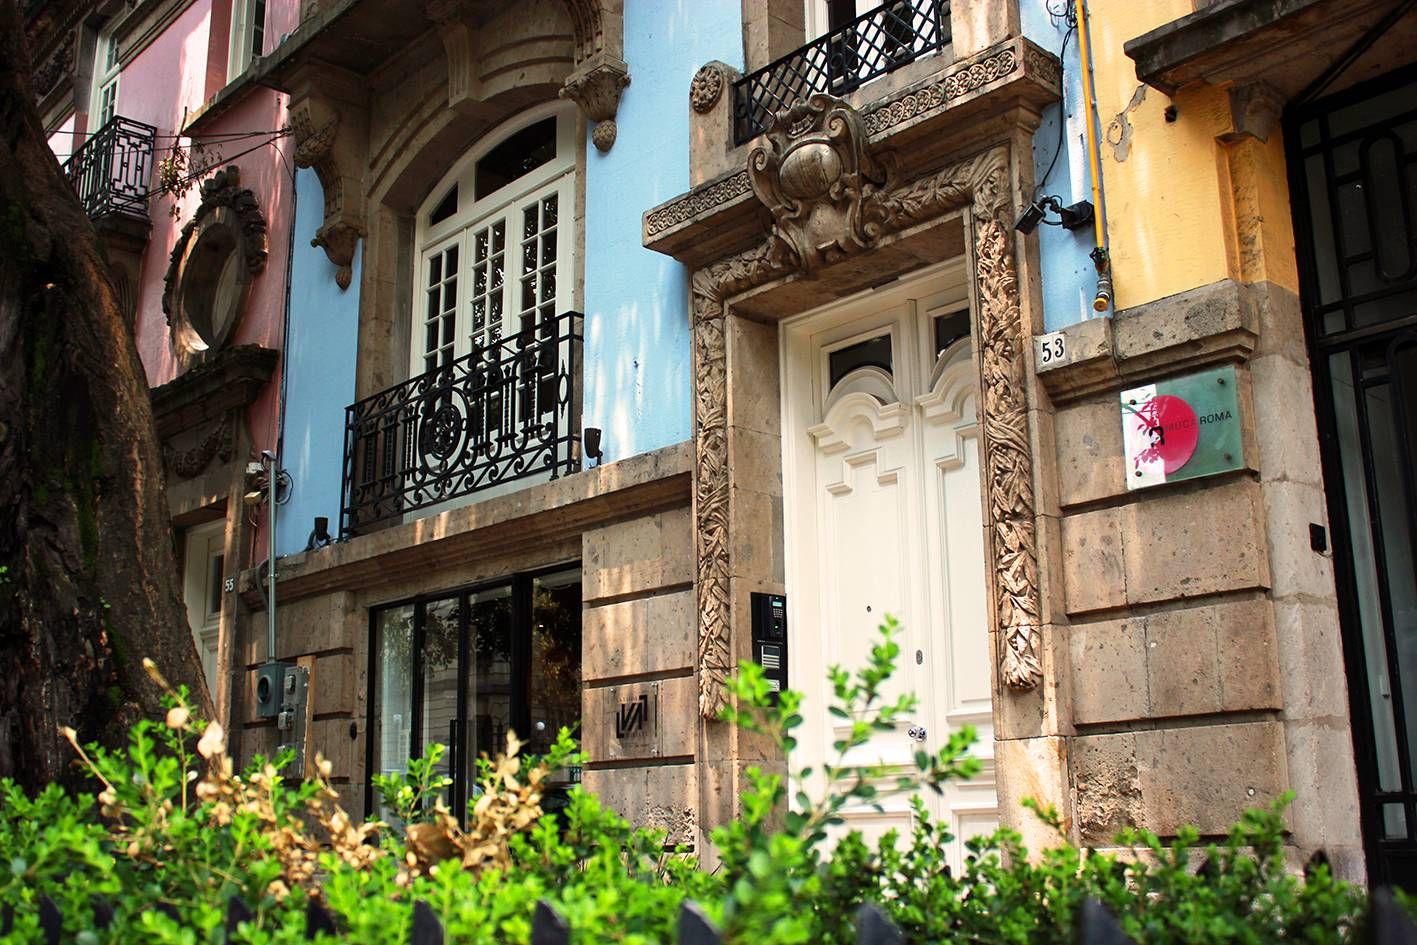 Mexico City S Hotel La Valise Showcases Decades Of Style